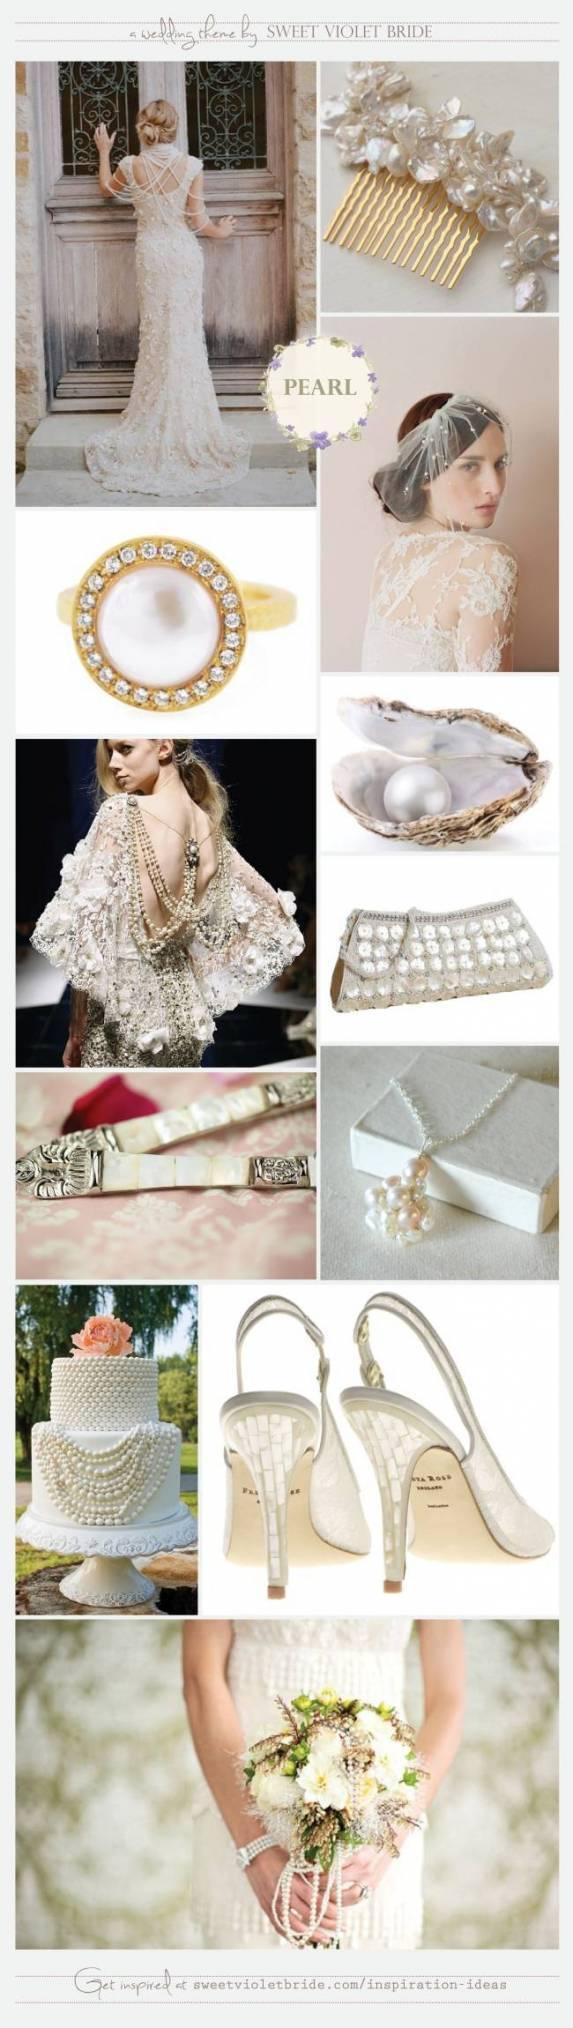 freshwater mother of pearl wedding scheme